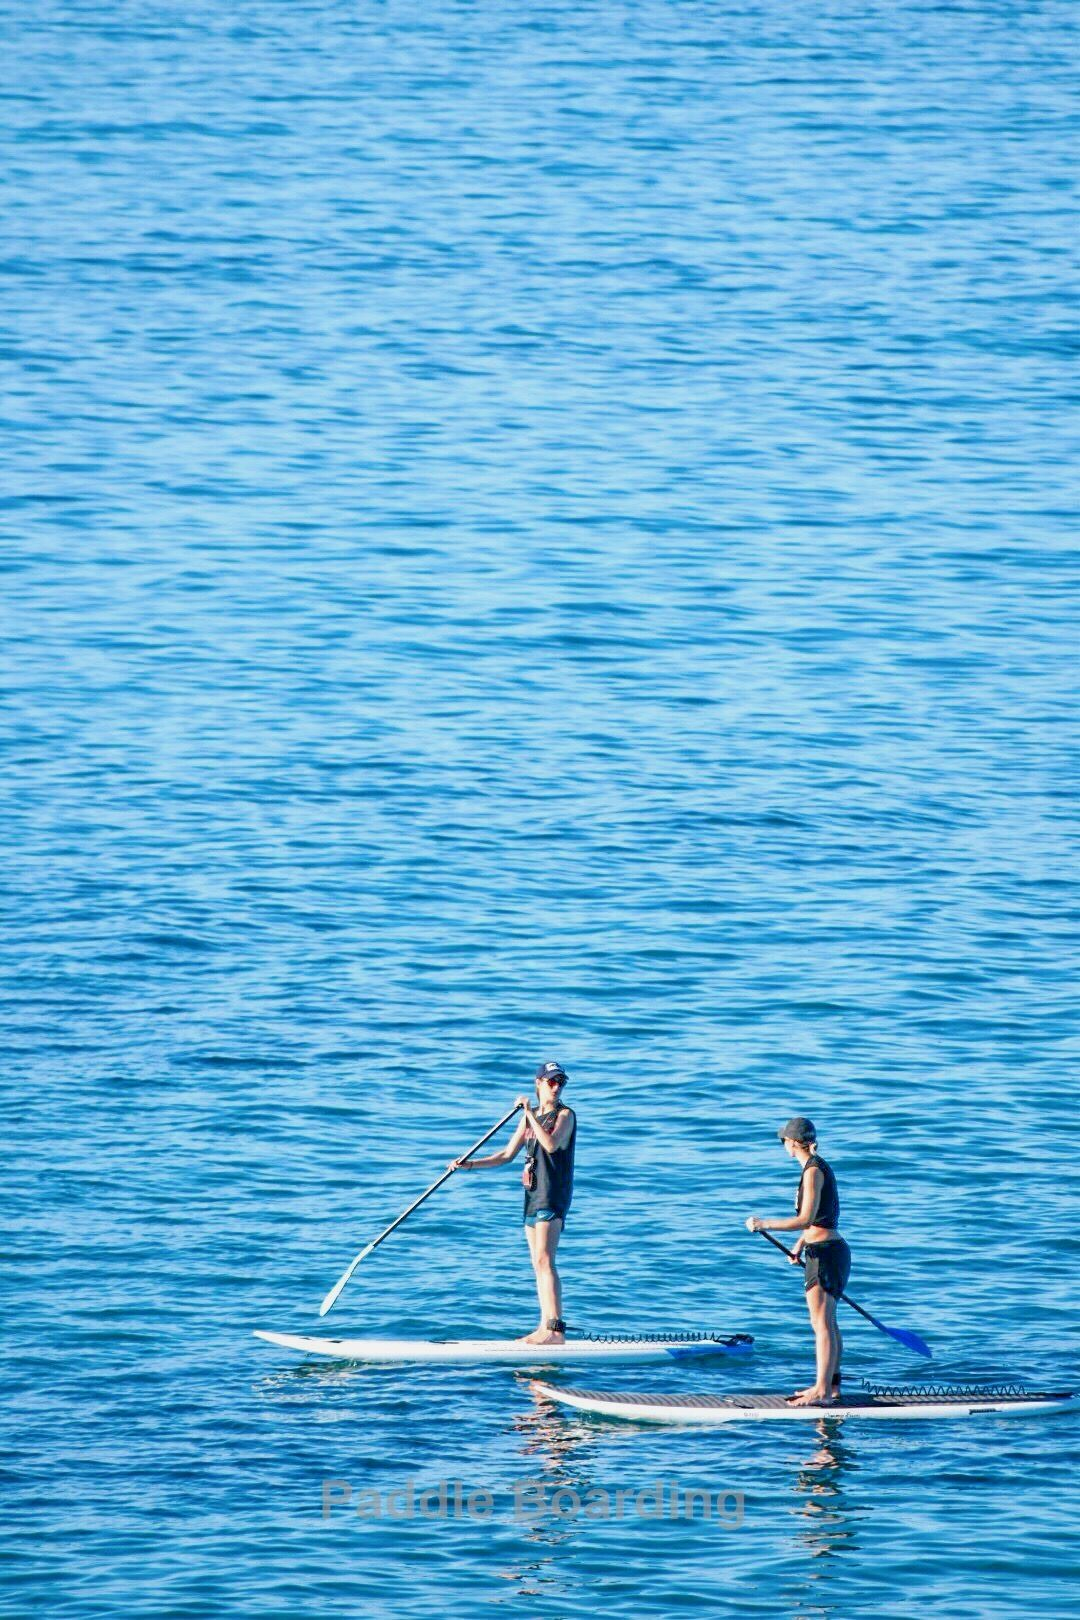 maui paddle boards   Paddle boarding, Standup paddle, Paddle